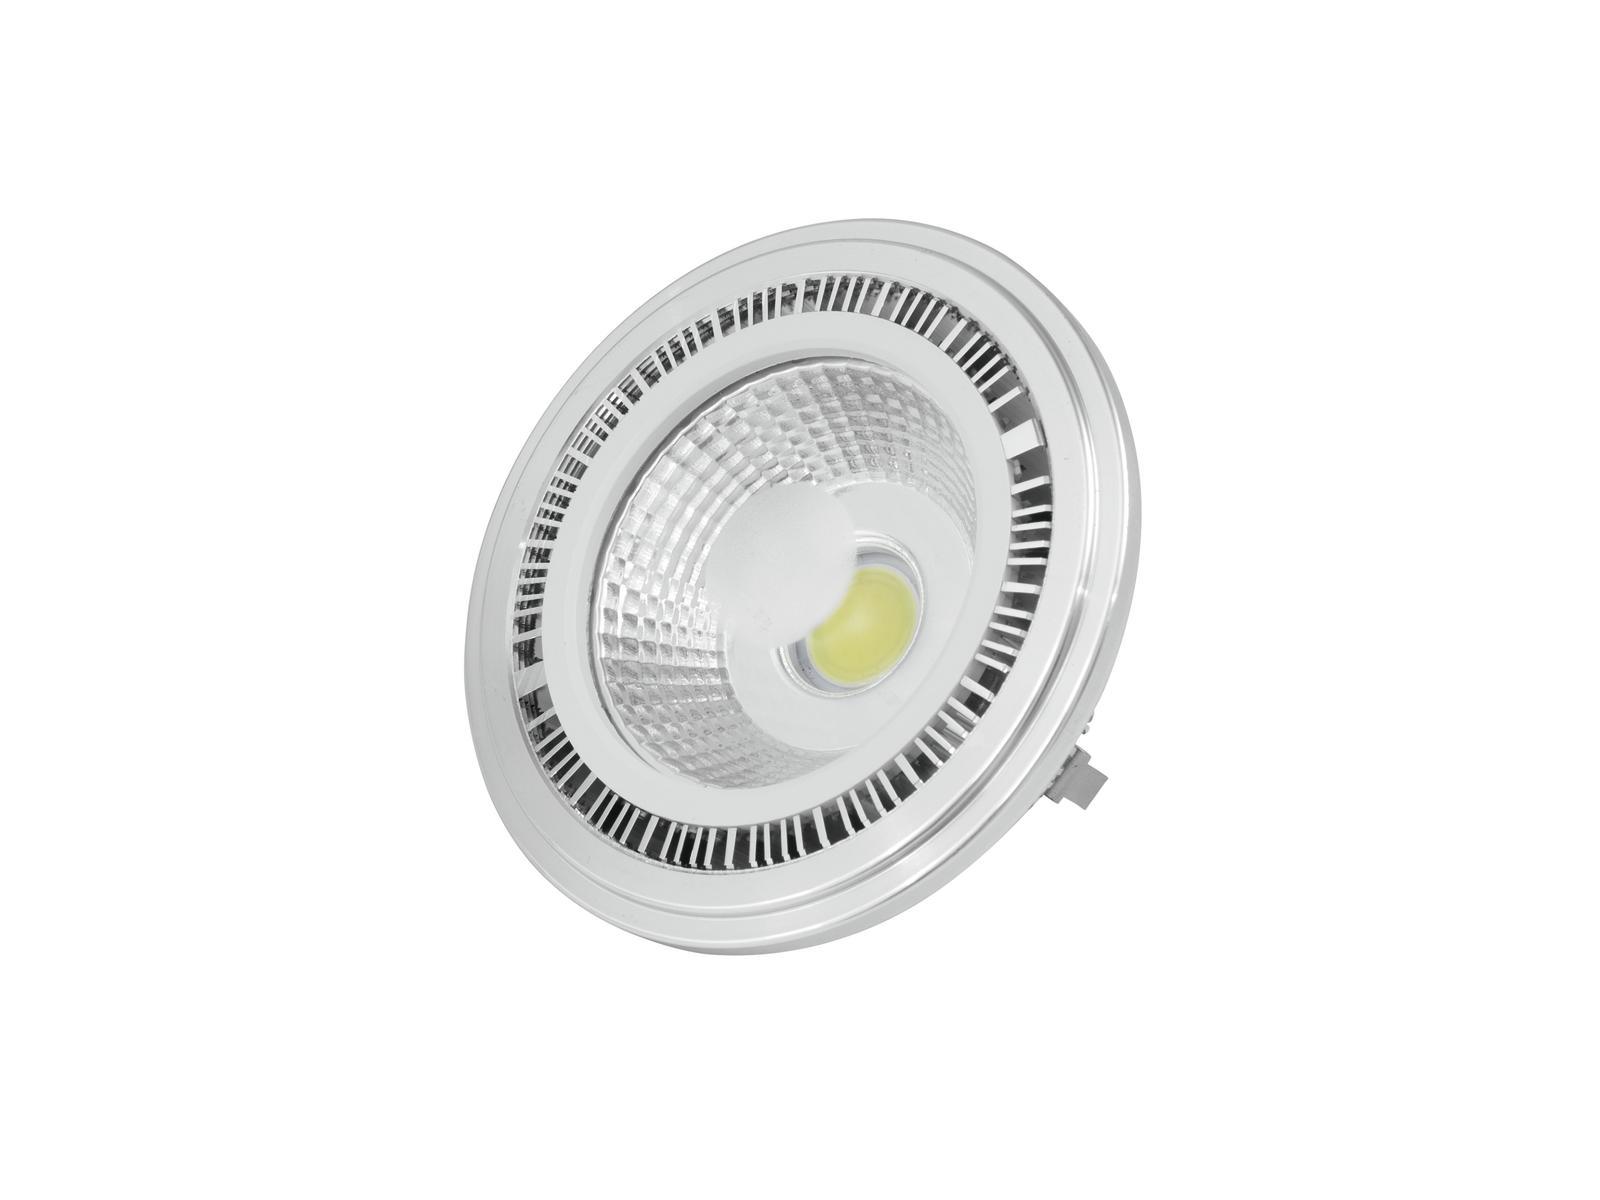 Omnilux LED AR111 COB 12V 7W 6400K